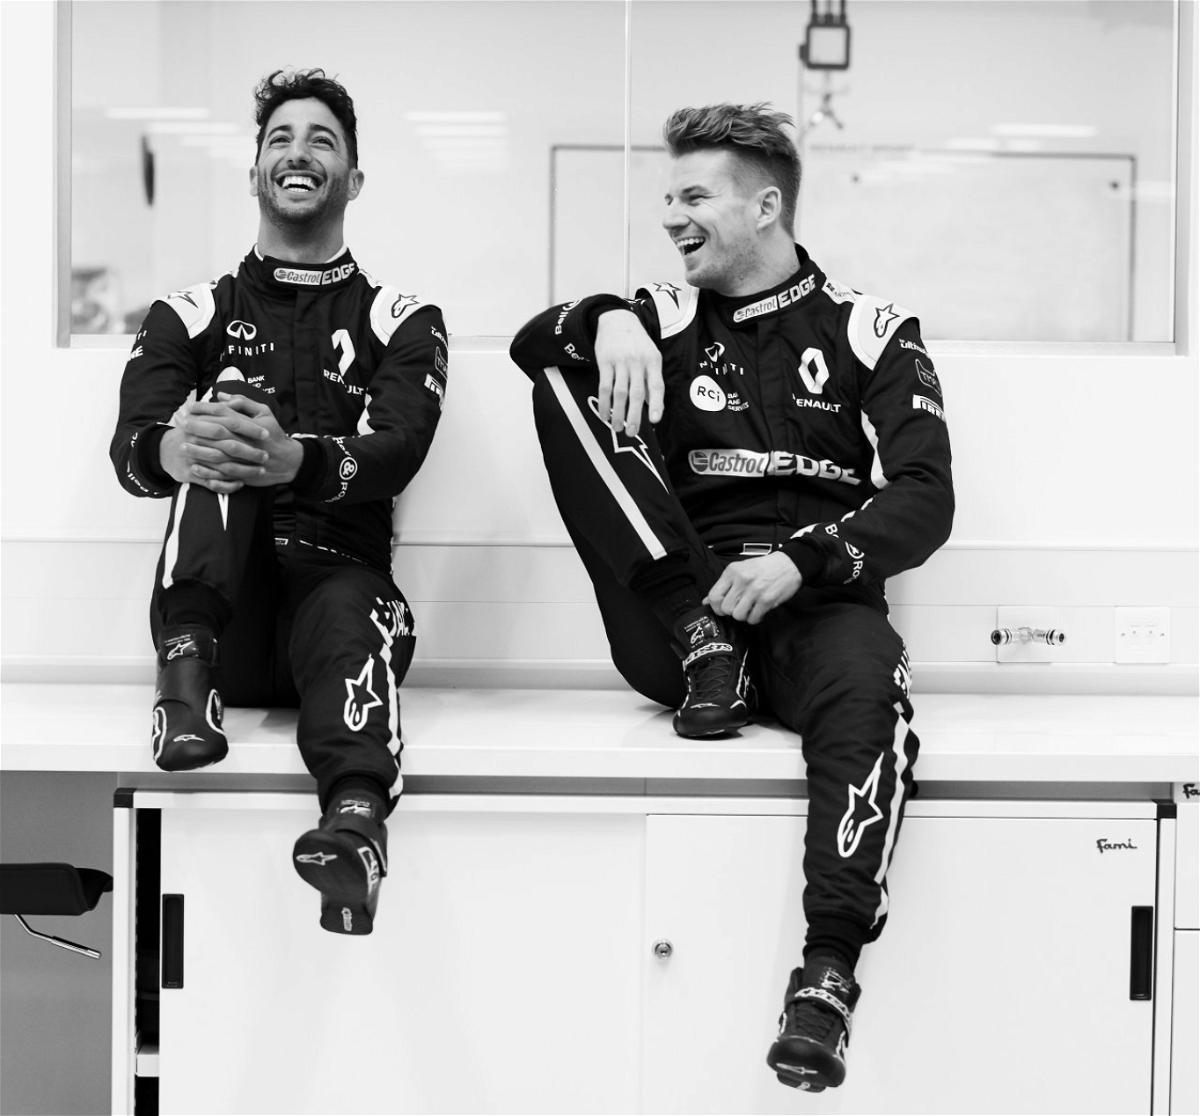 Renault Tease Daniel Ricciardo's New Kit